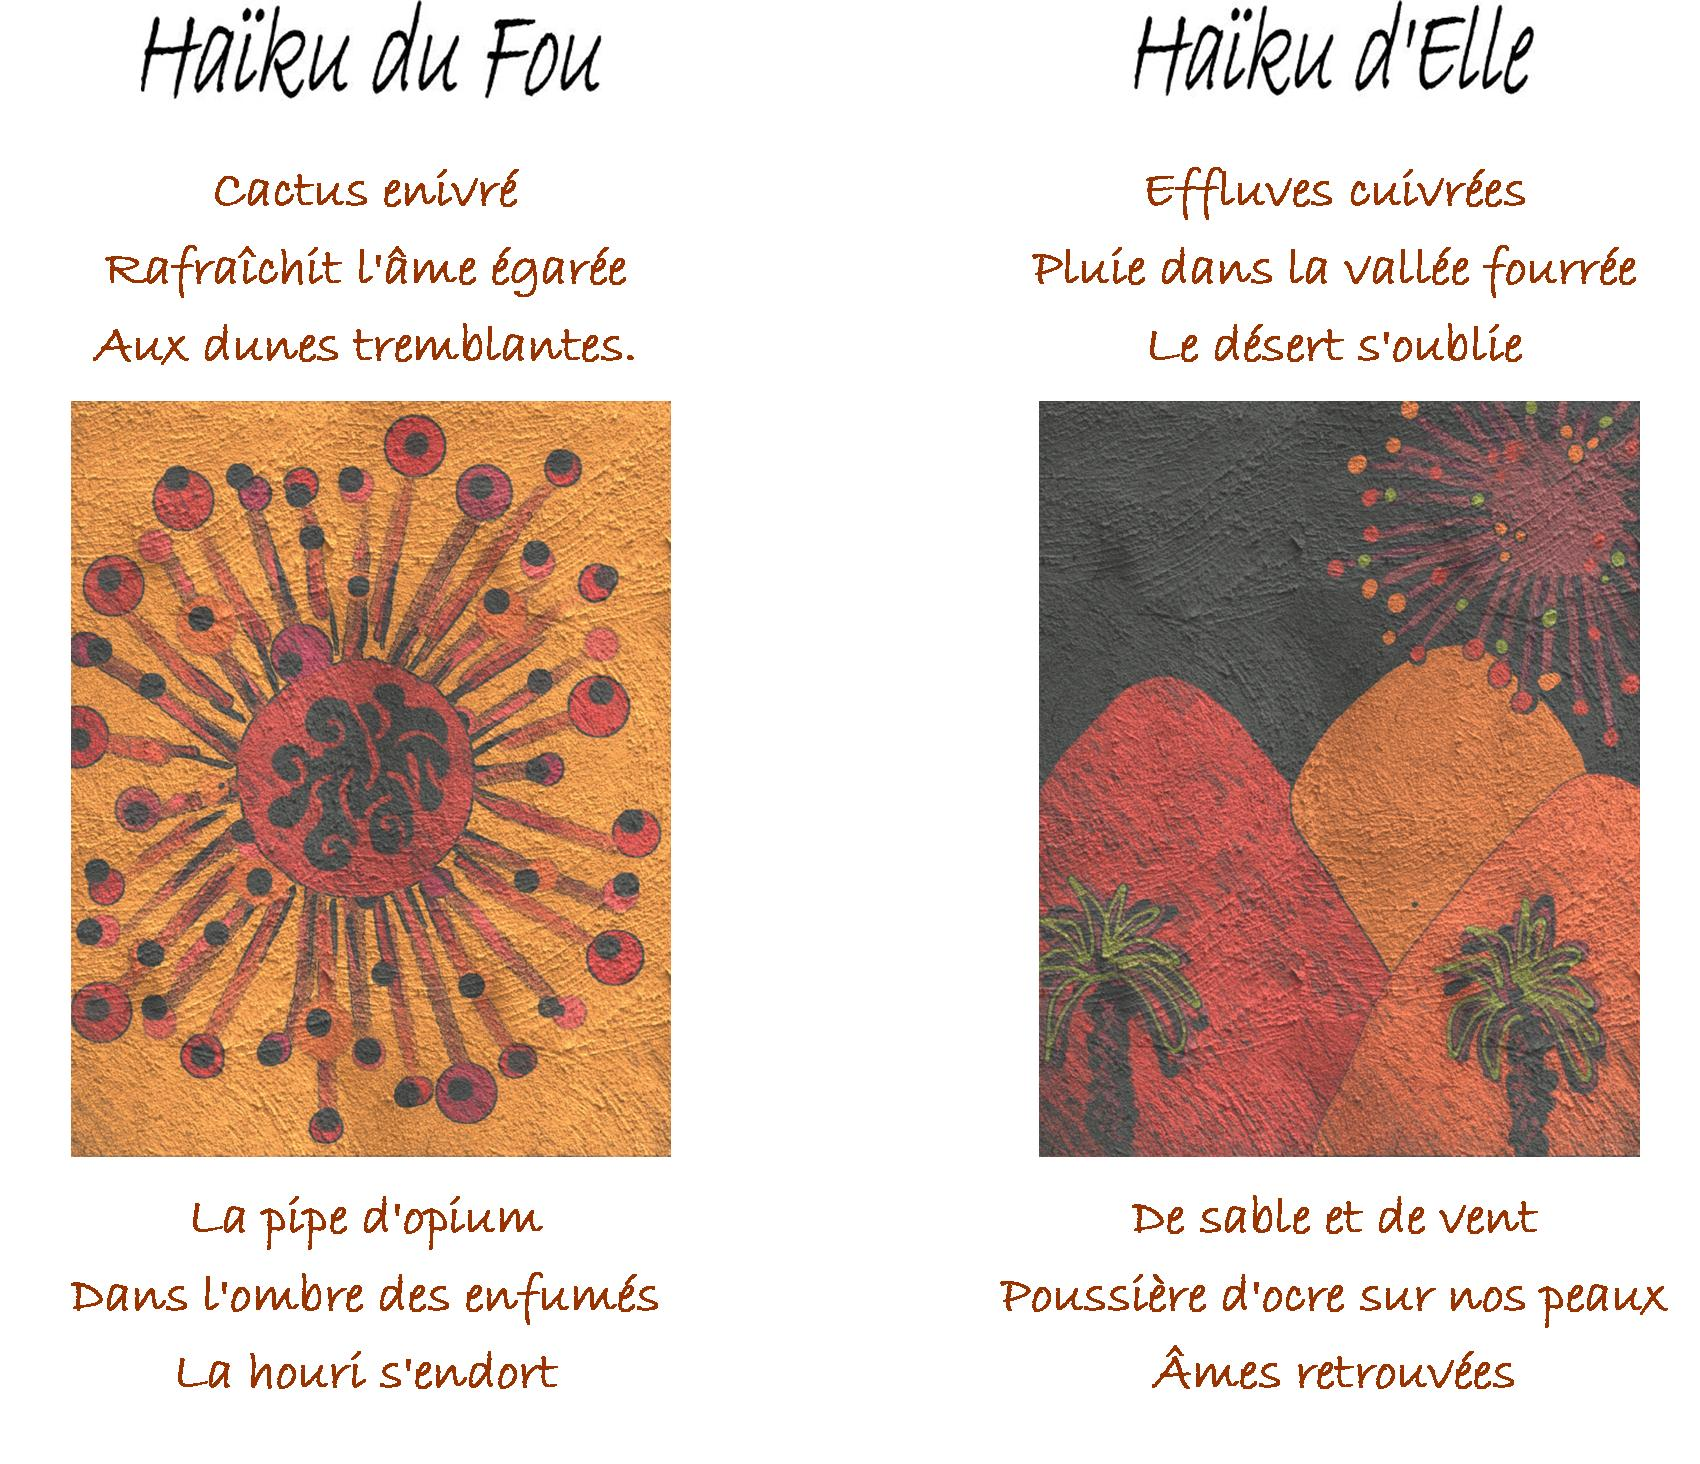 haiku mix 13